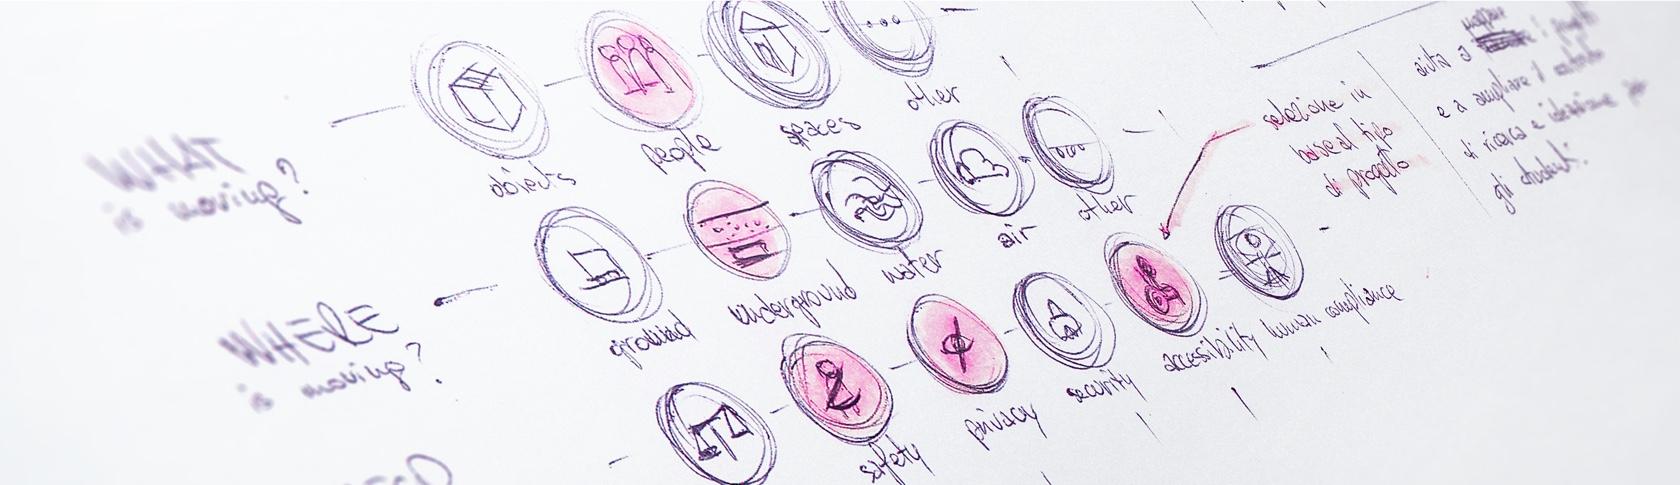 Self-Driving Society Matrix Draft - Fabio Besti Interdisciplinary Design